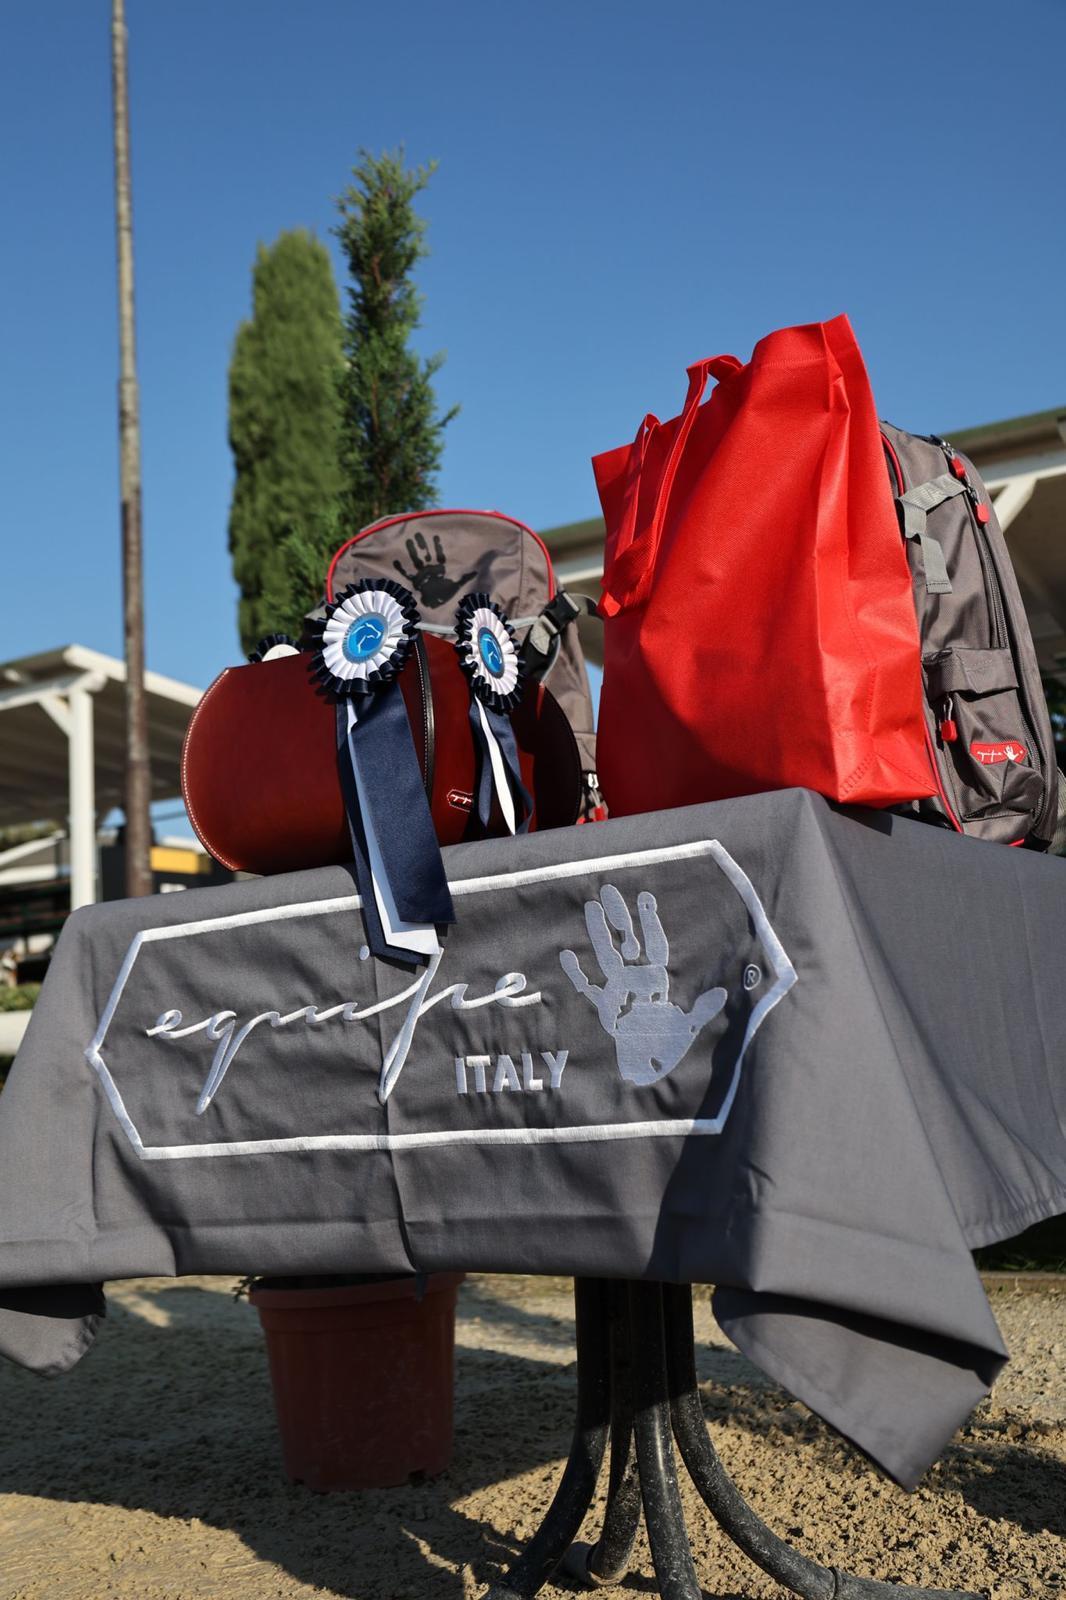 Al via i Campionati Italiani Giovanili e Pony 2021